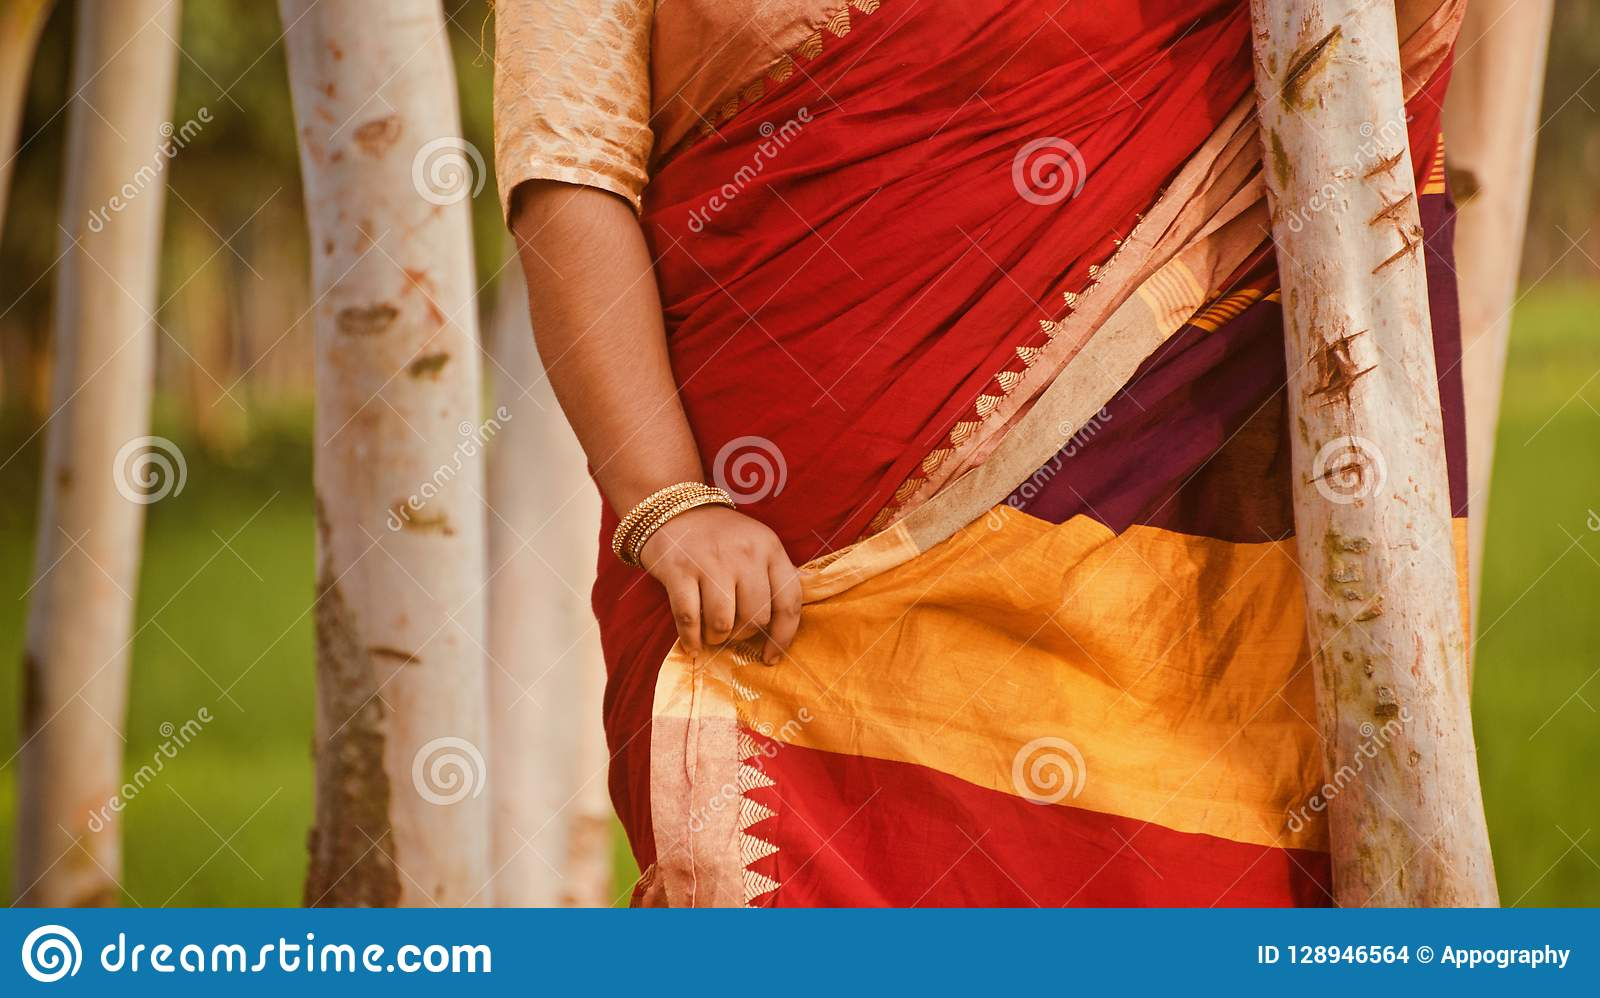 Lady standing wearing stylish saree unique photo